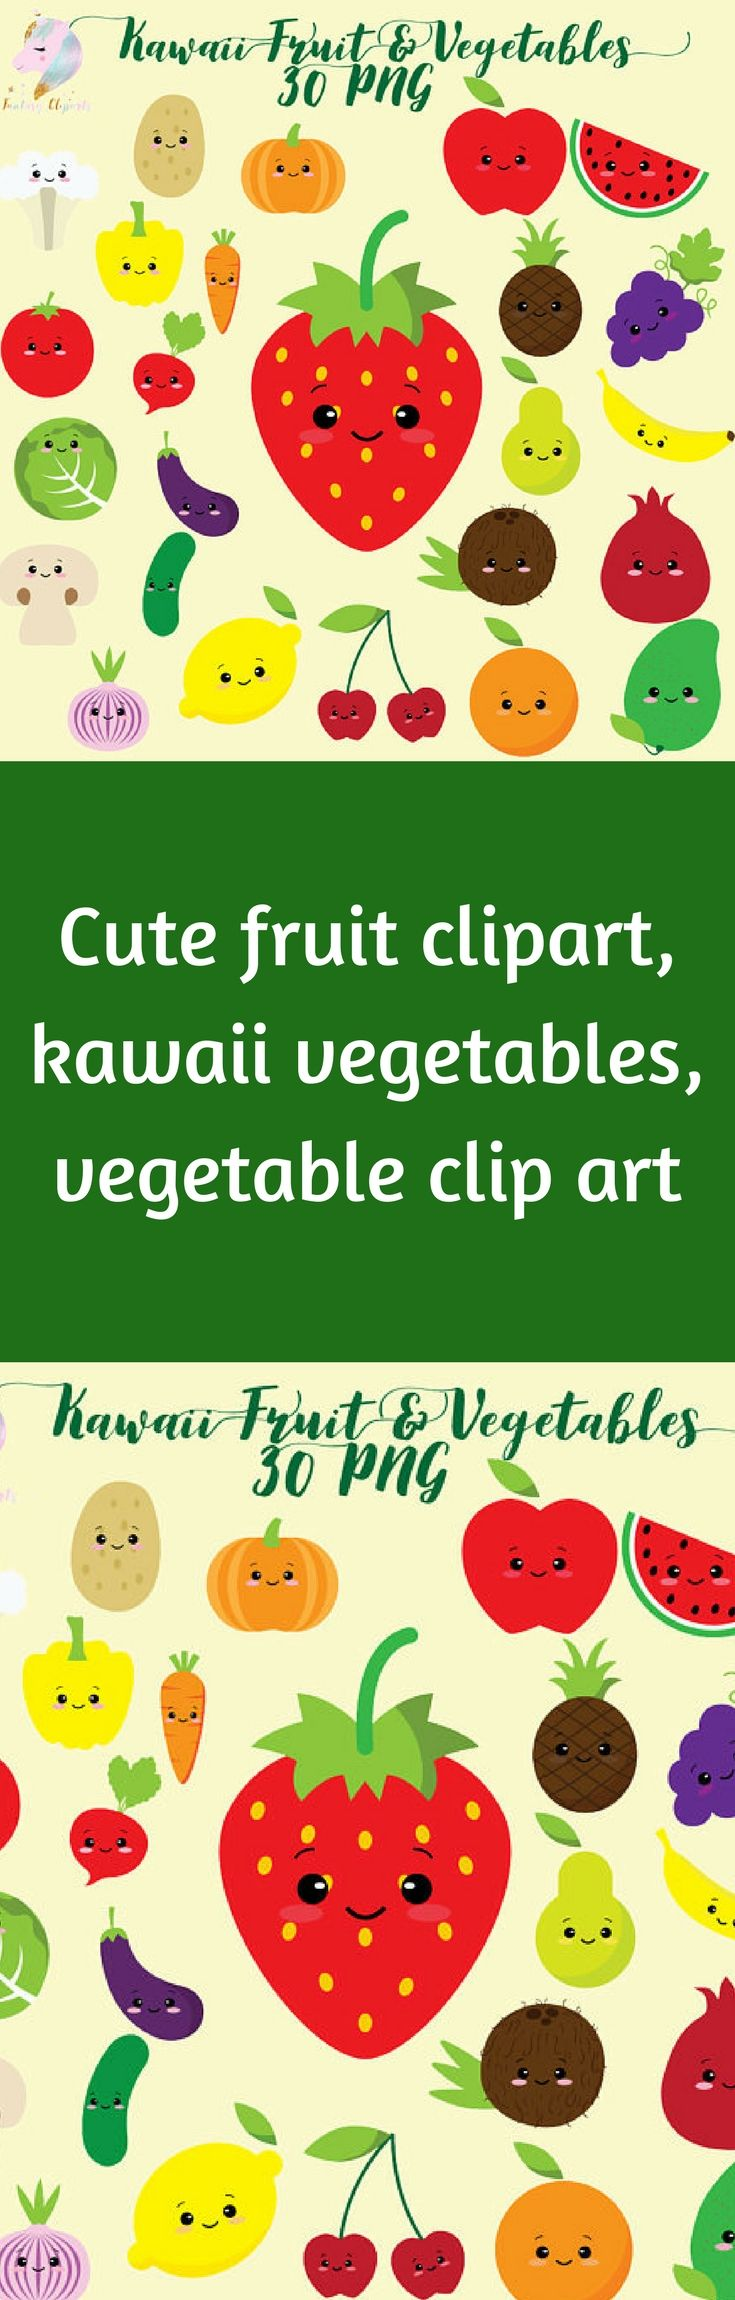 Cute Fruit Clipart Kawaii Vegetables Vegetable Clip Art Colorful